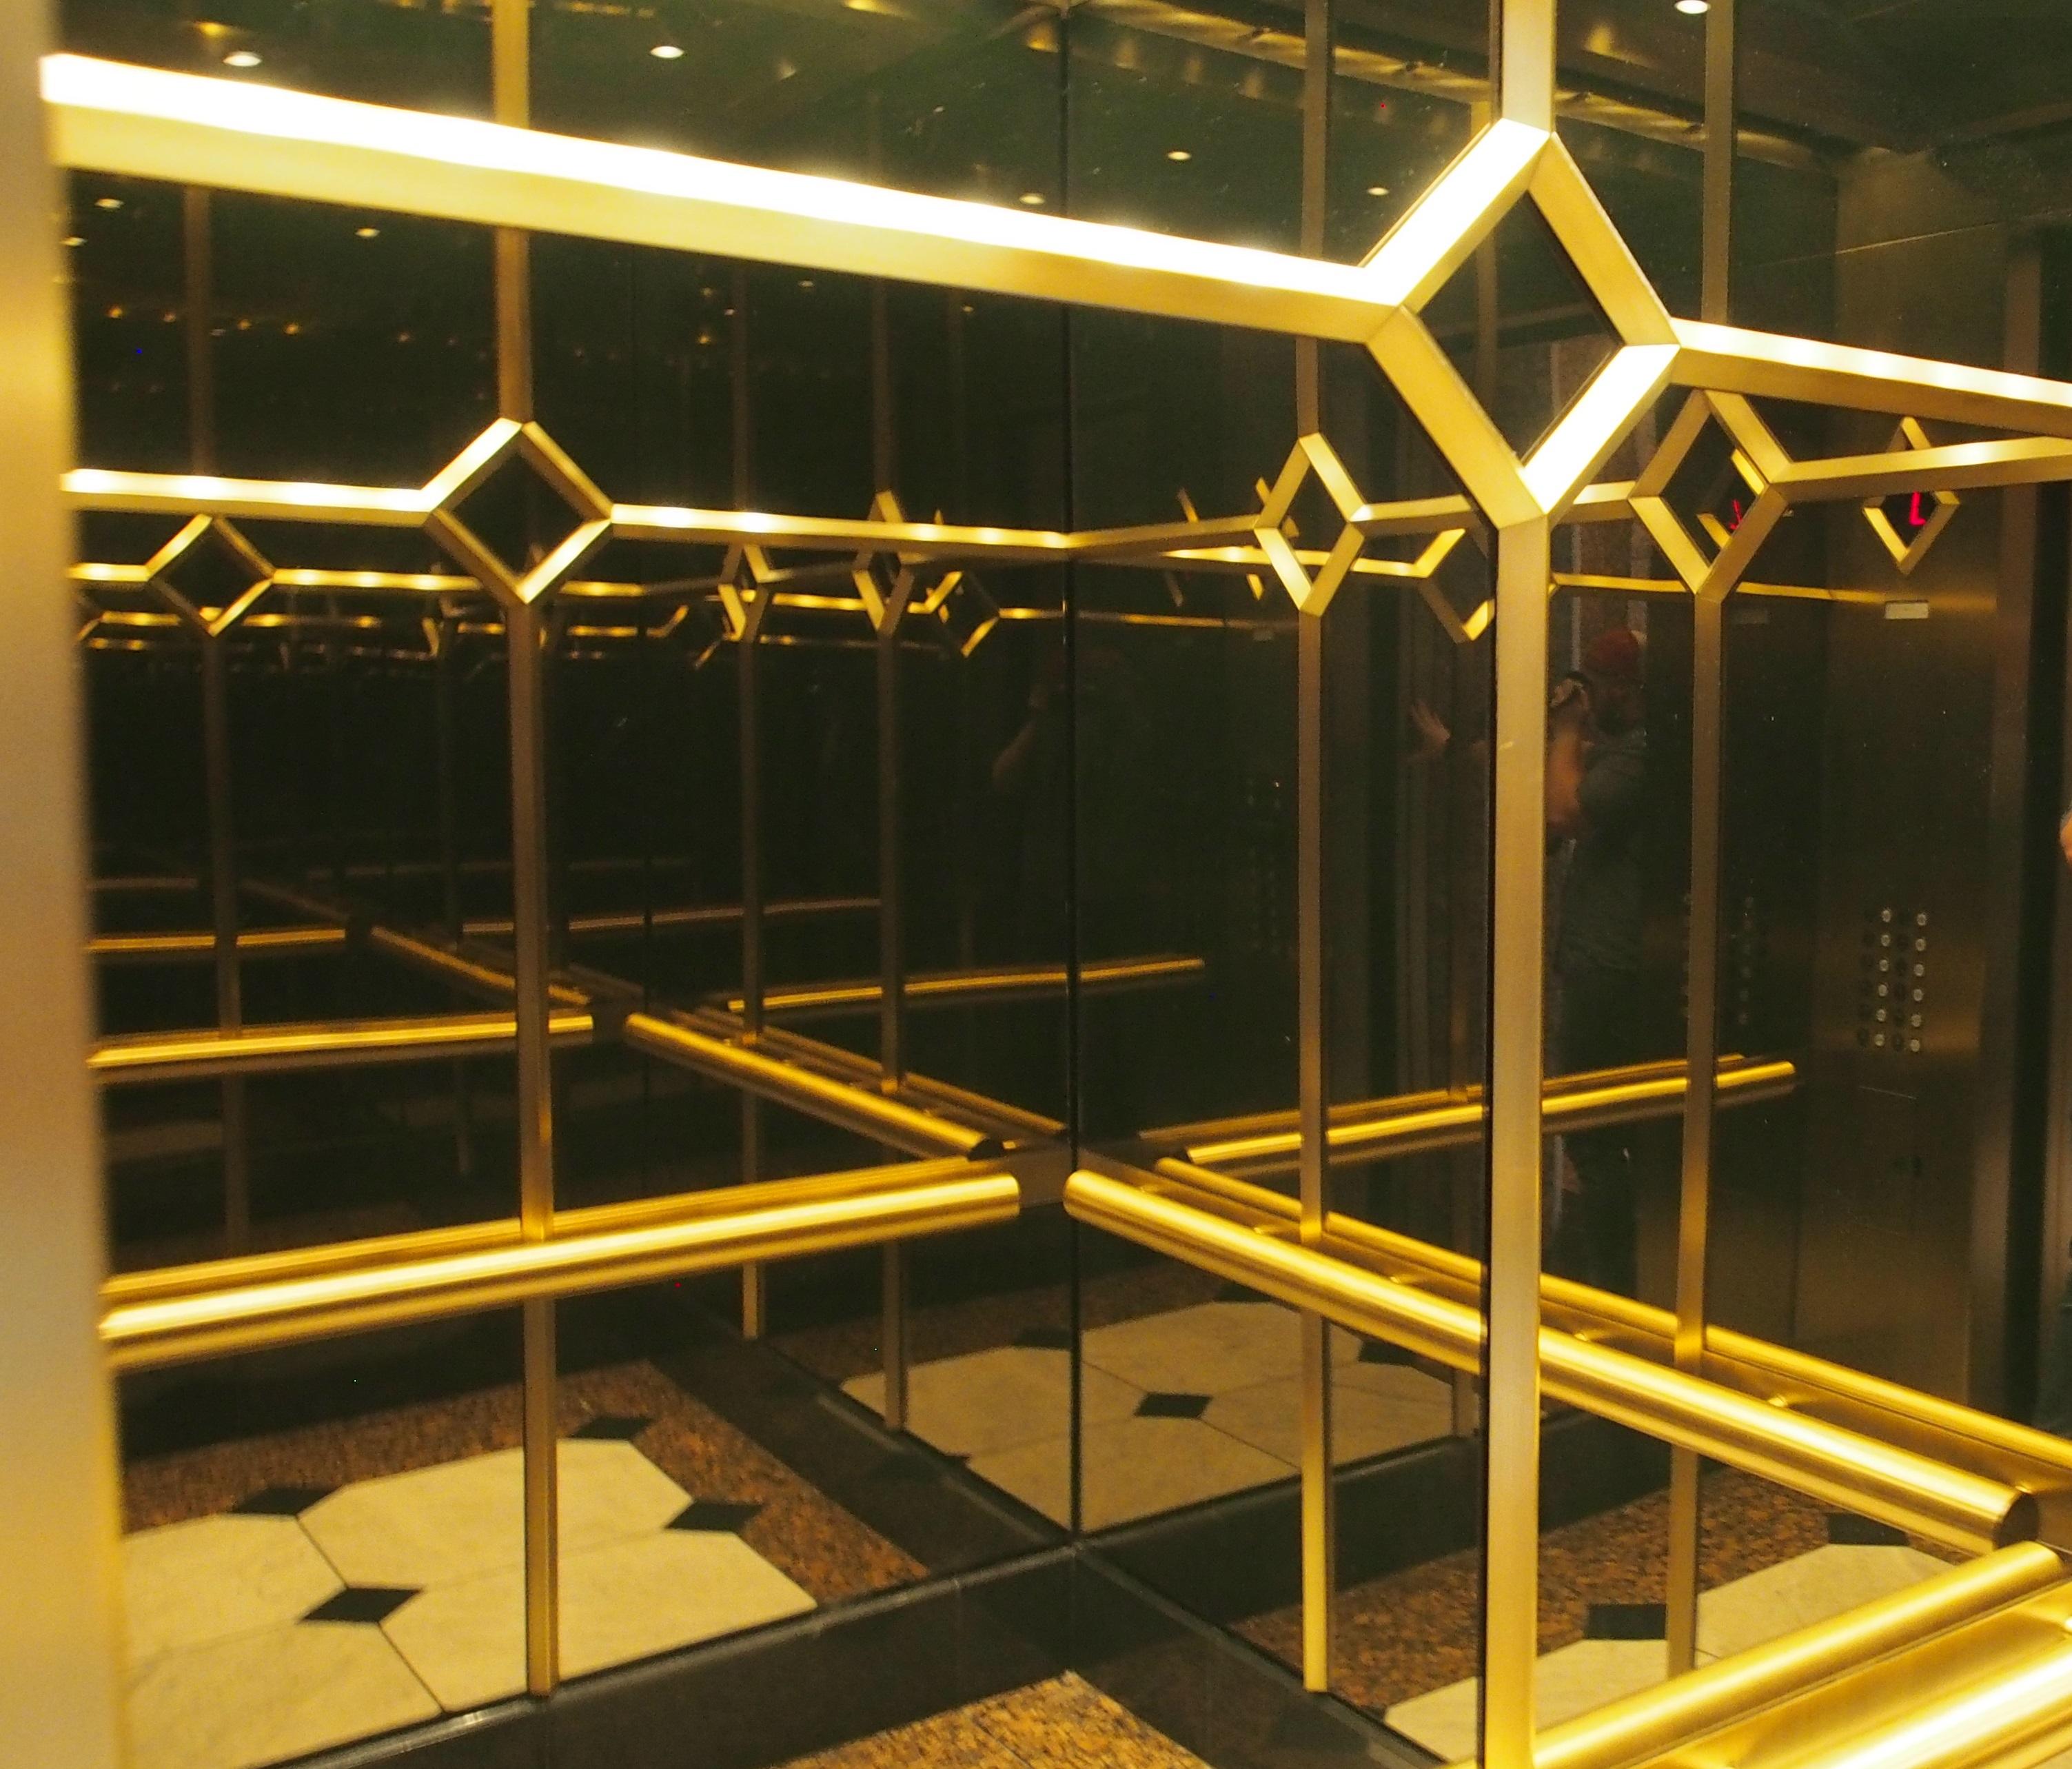 Bronze and stone elevator cab interior